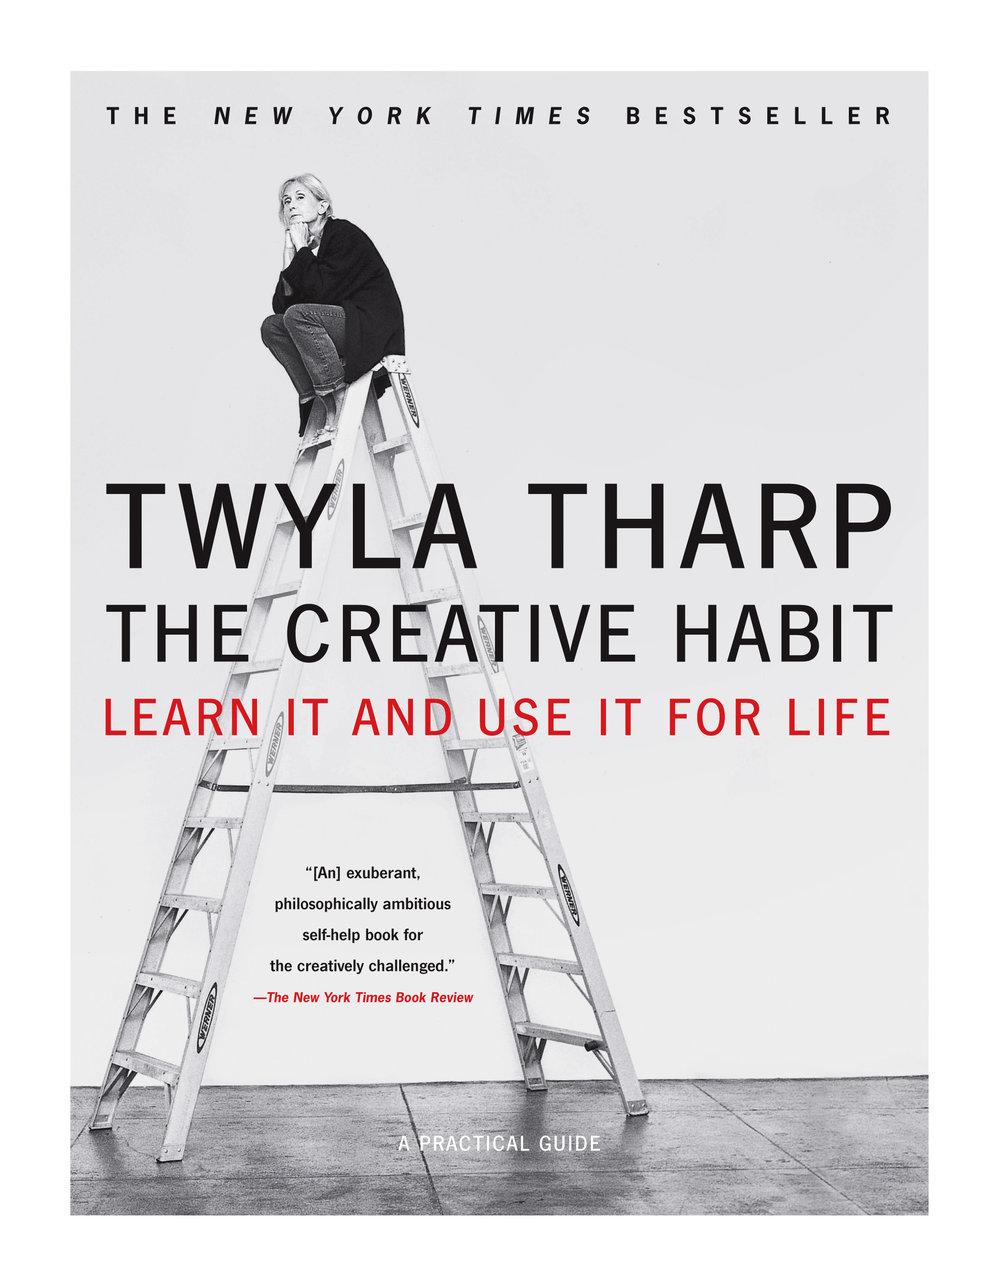 TaylorLeePaints_TwylaTharpBookTheCreativeHabit